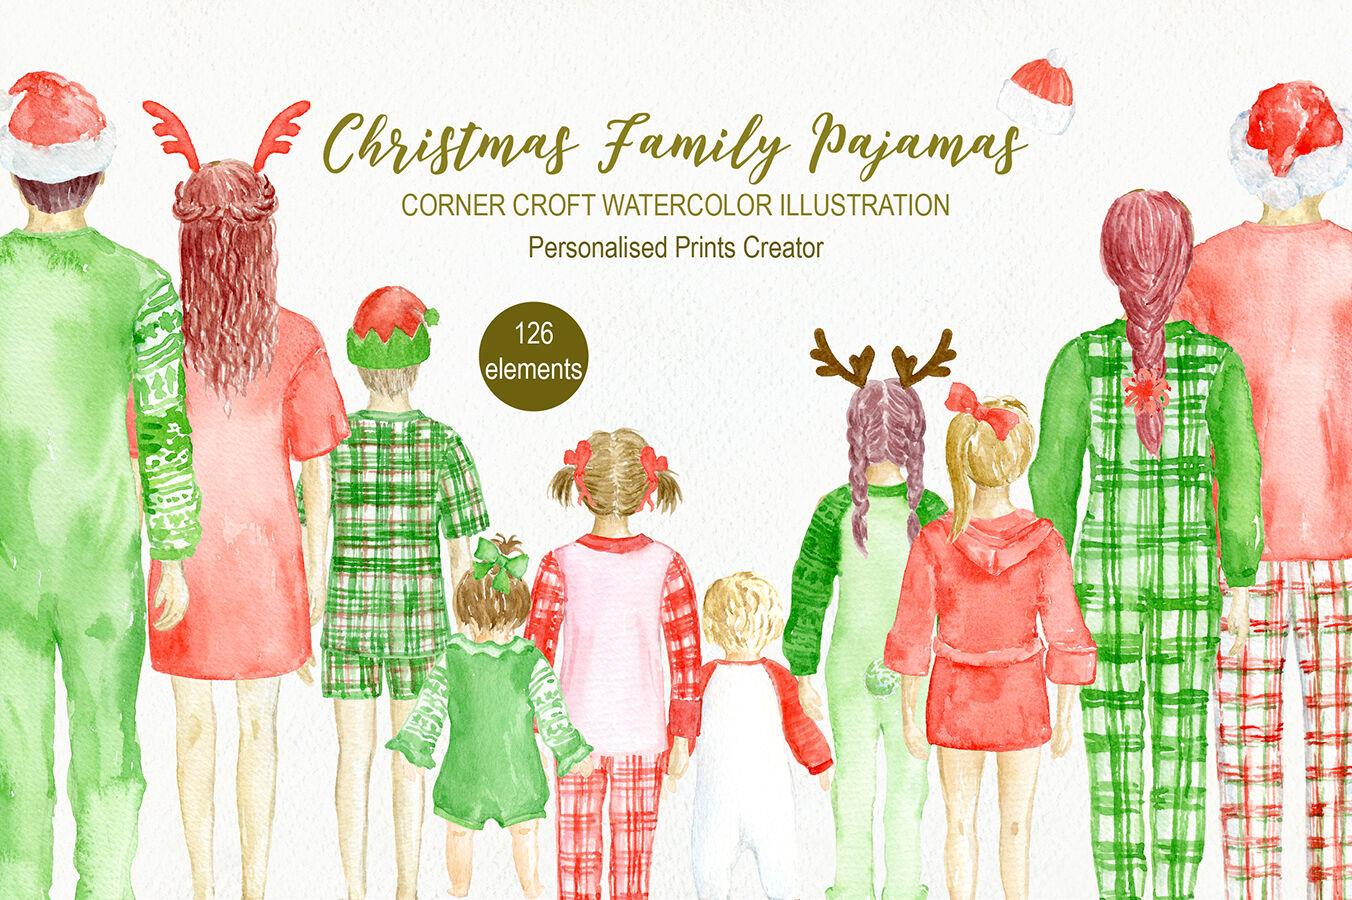 Watercolor Christmas Family Pyjamas Illustration By Cornercroft